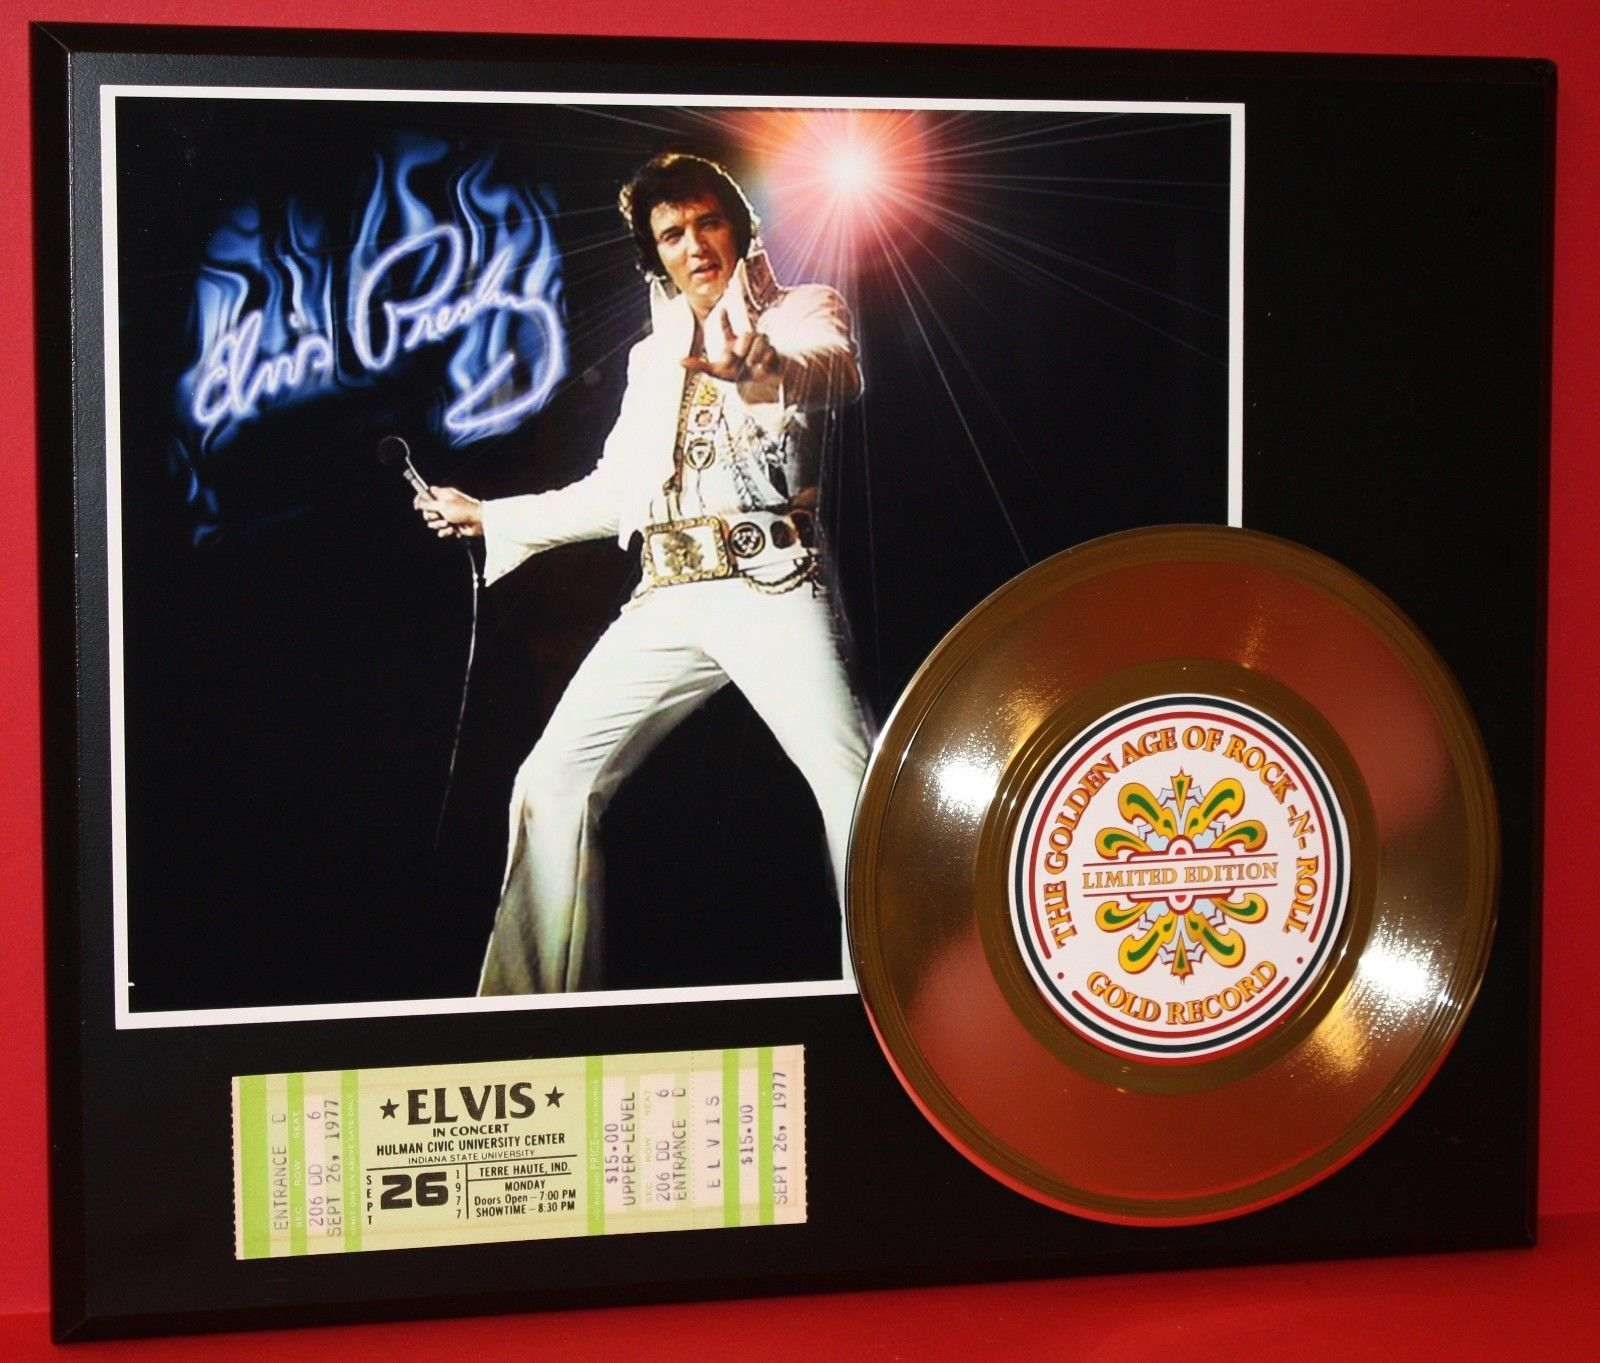 Elvis Presley Concert Ticket Series Gold Record Ltd Edition Display